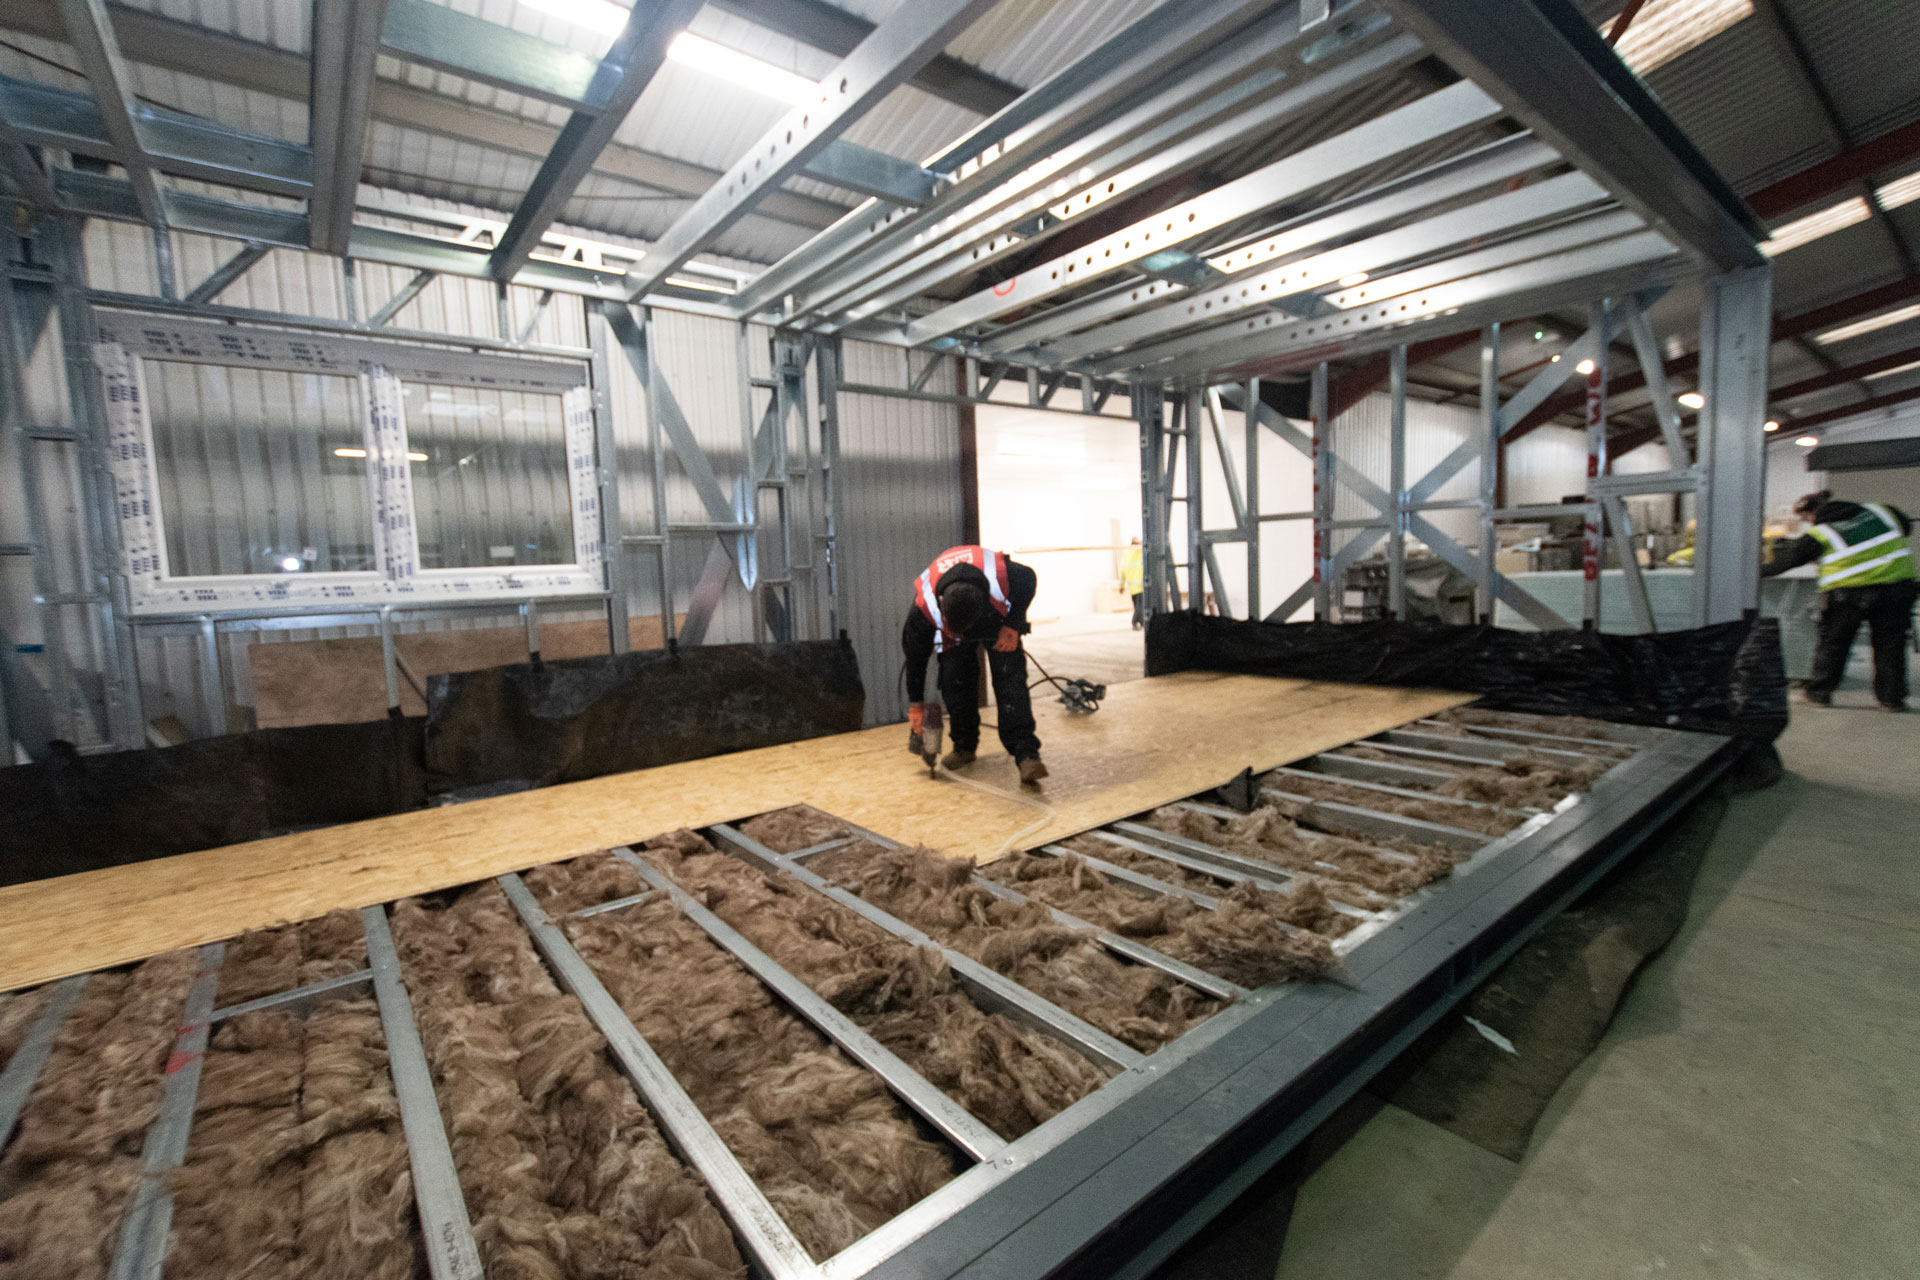 Housing 21 Retirement living modular apartments UK - Richard Onslow Court - Factory progress floor decks